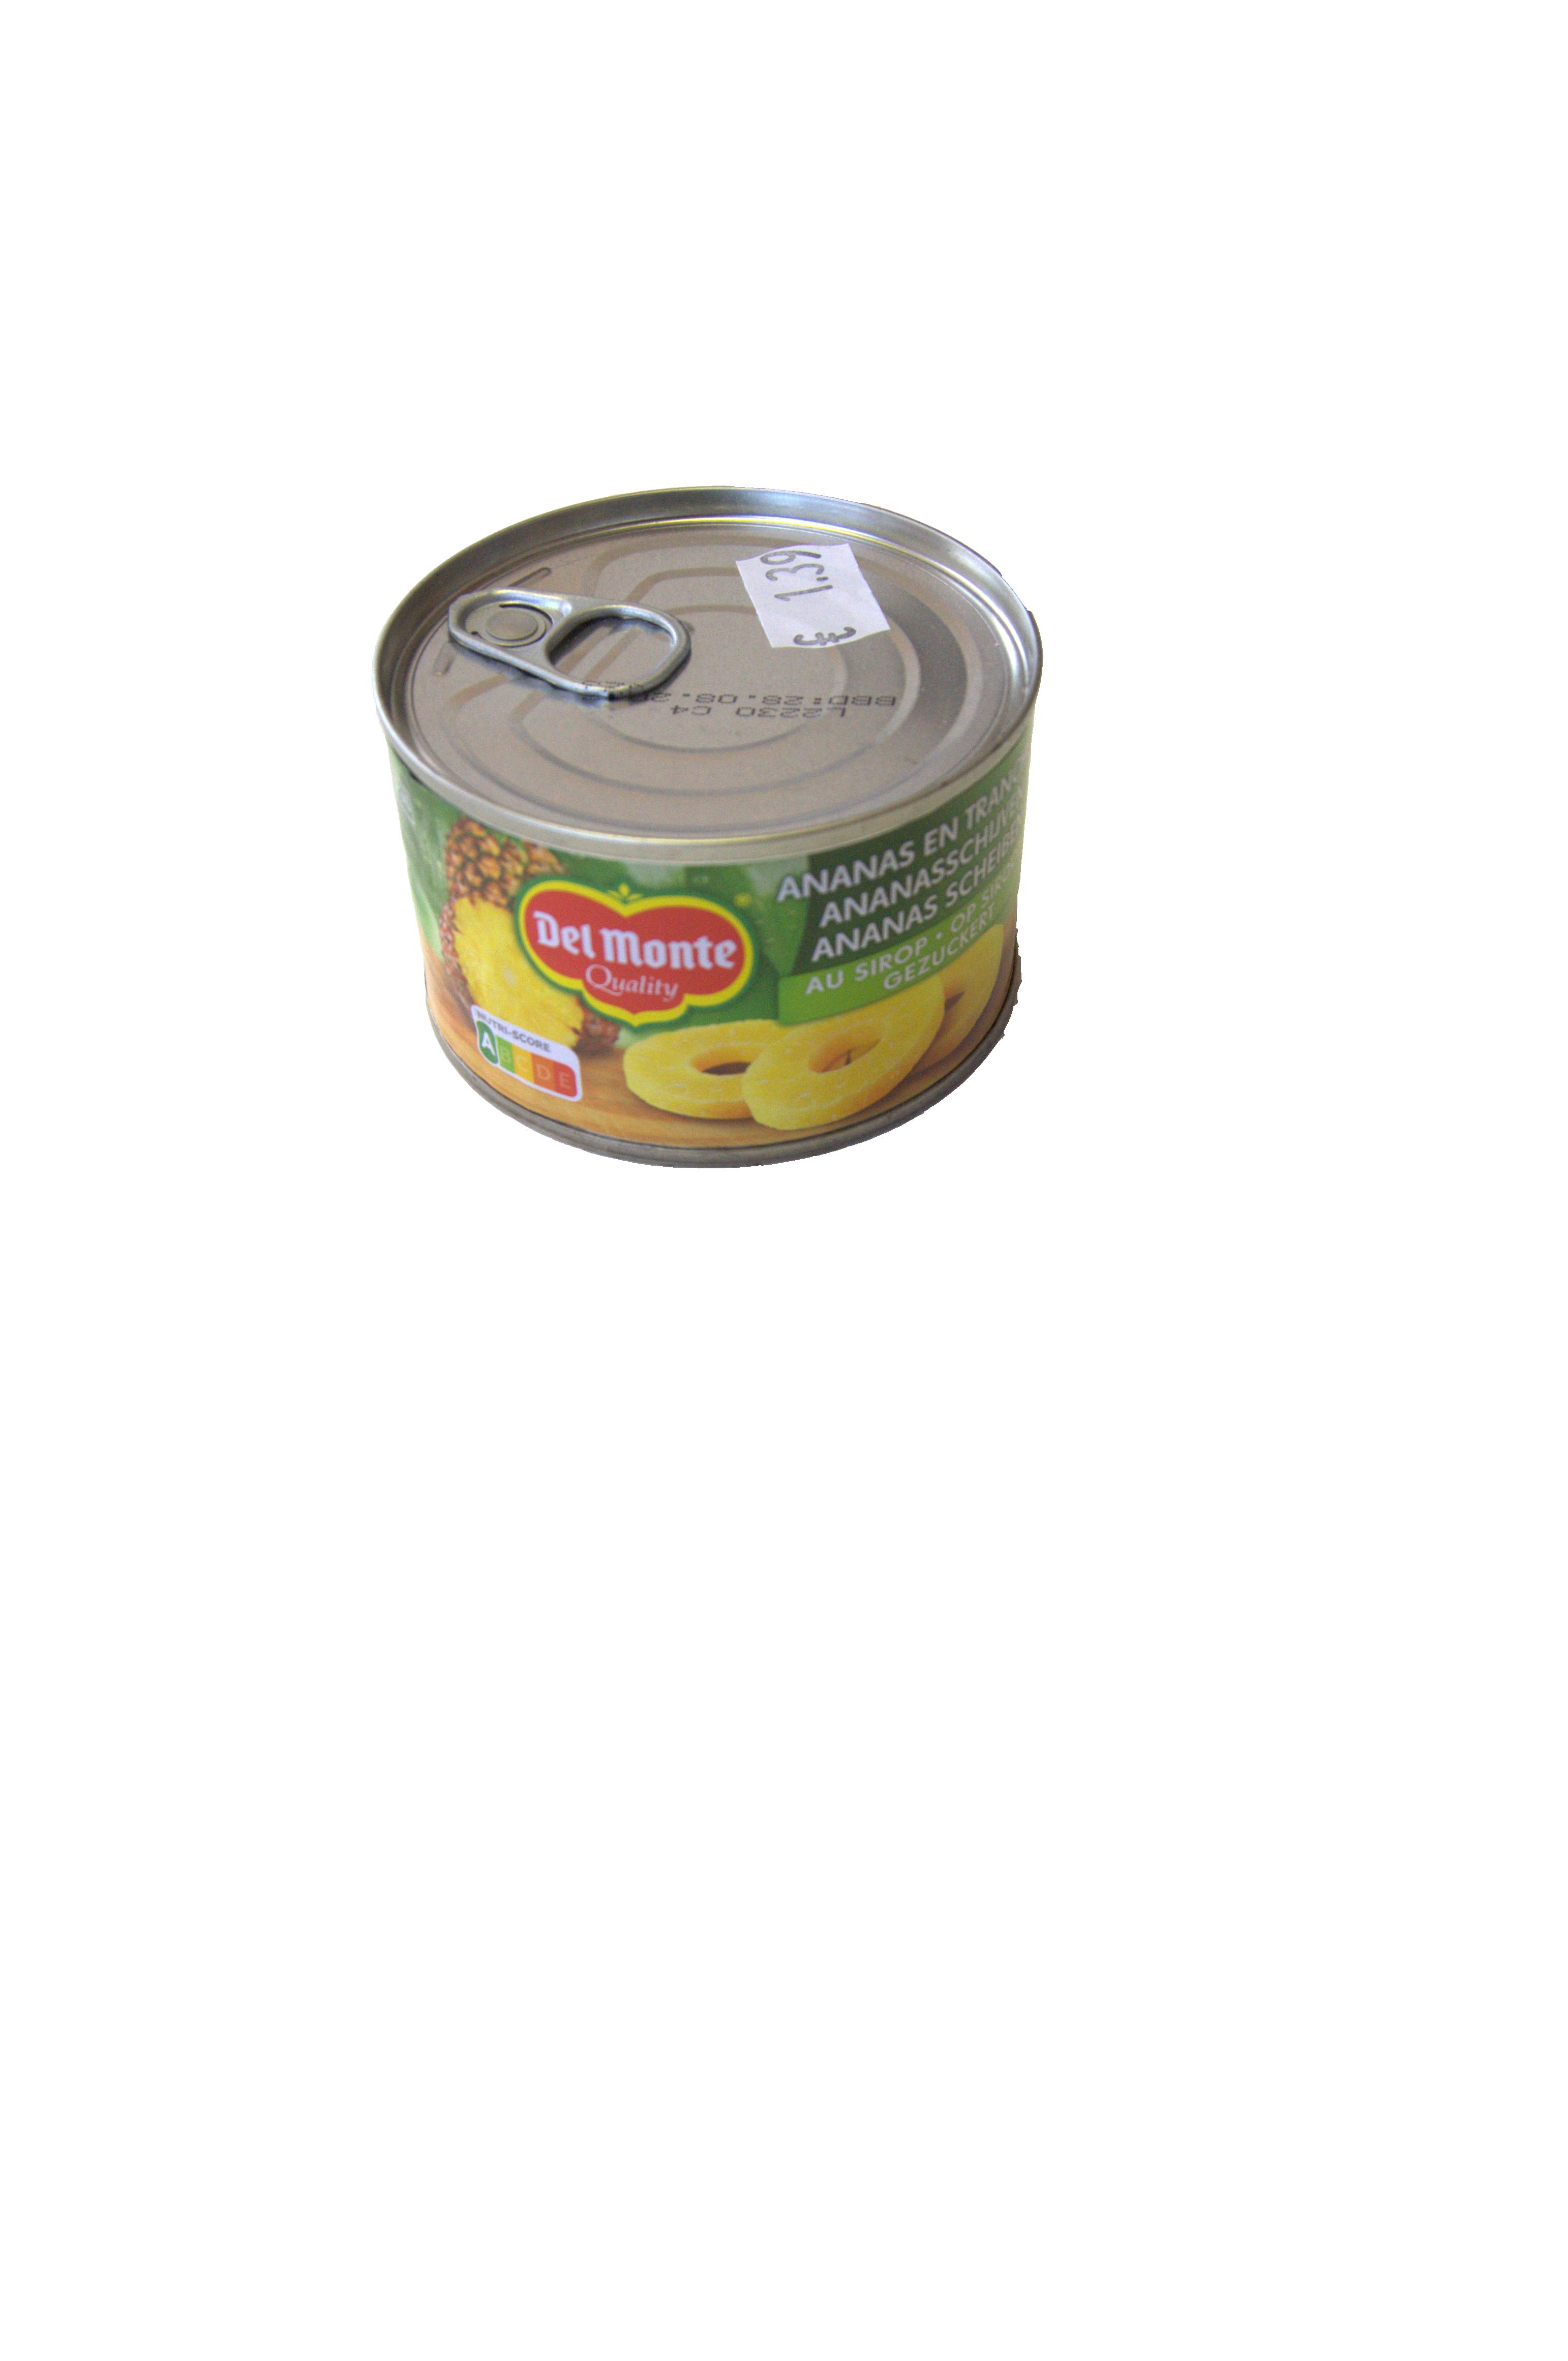 ananas schijf op siroop delmonte 235g